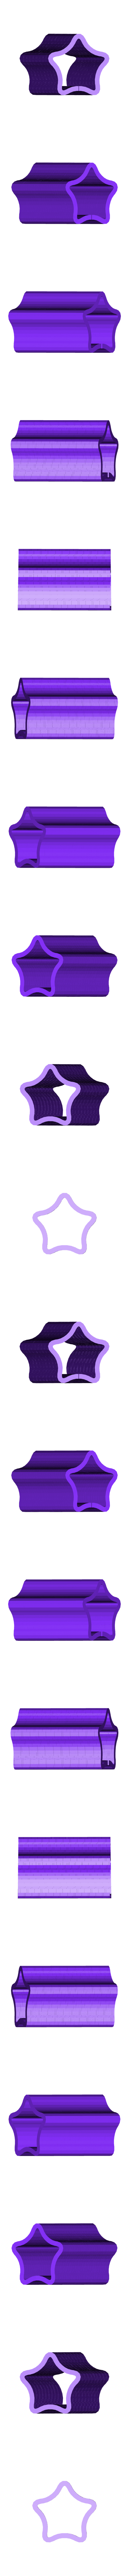 StarSlinky.stl Download free STL file Slinkies • Template to 3D print, Ristrorg